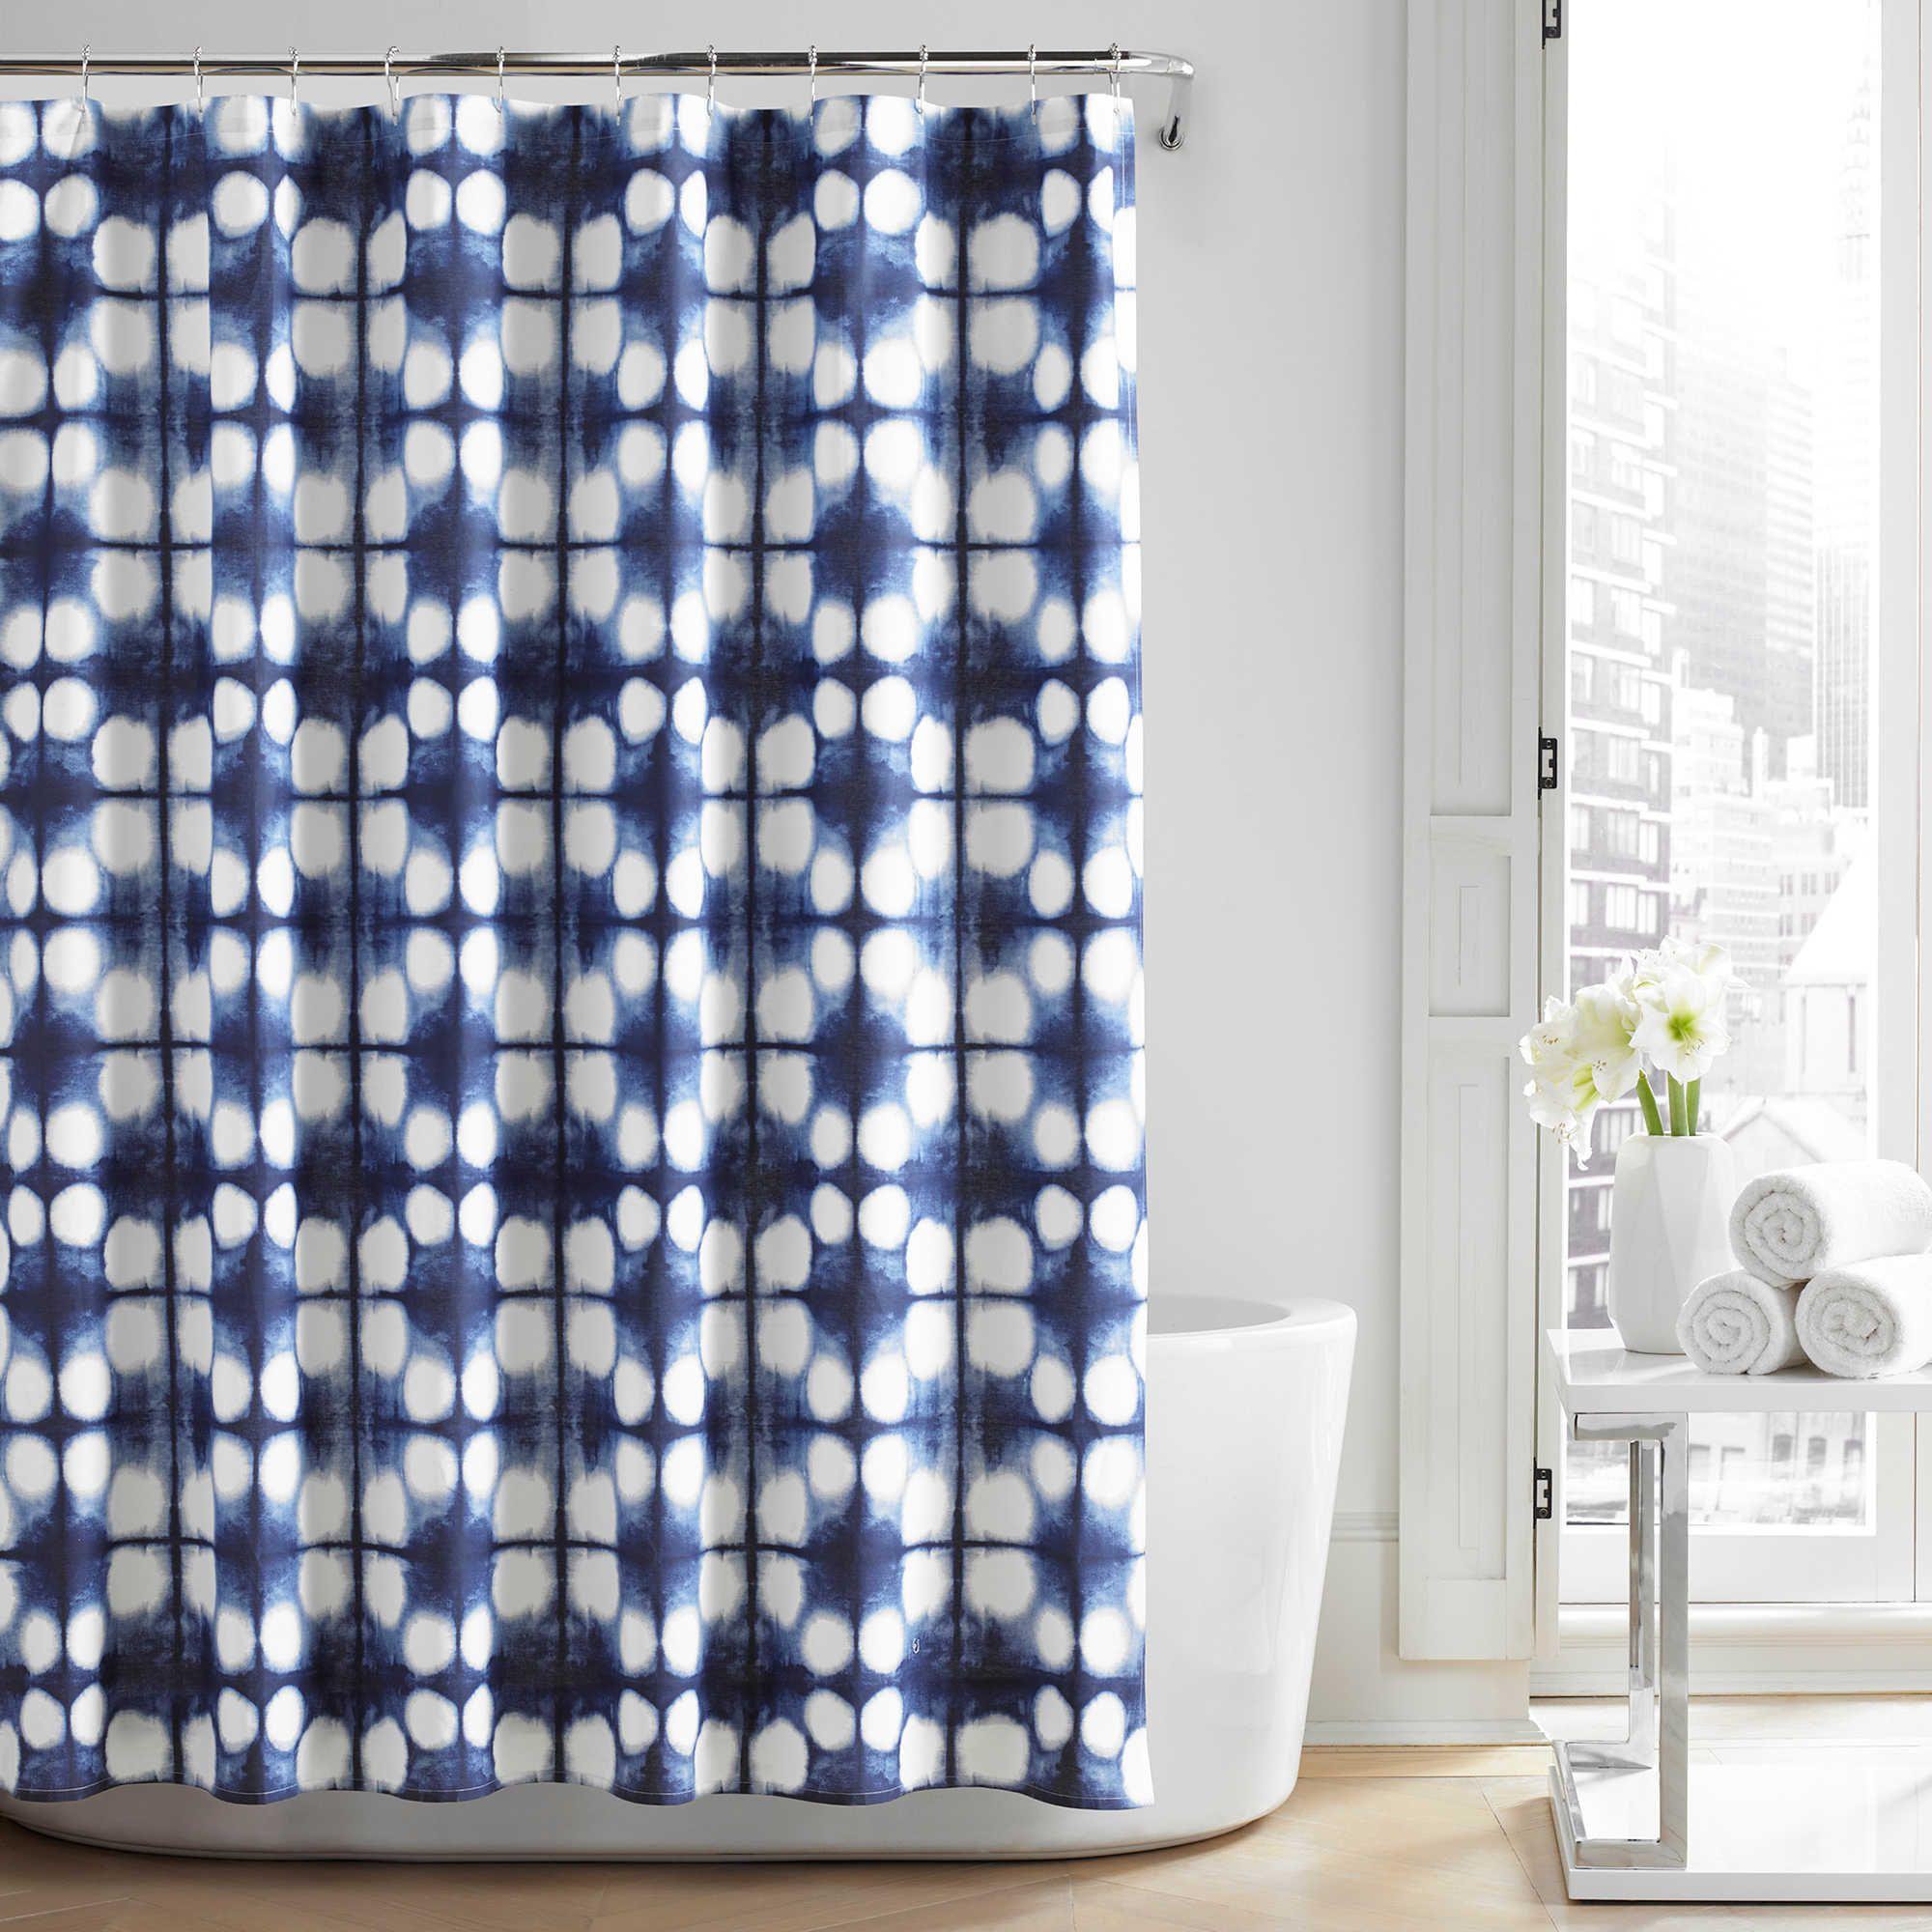 City LoftTM Nona Shower Curtain In Navy